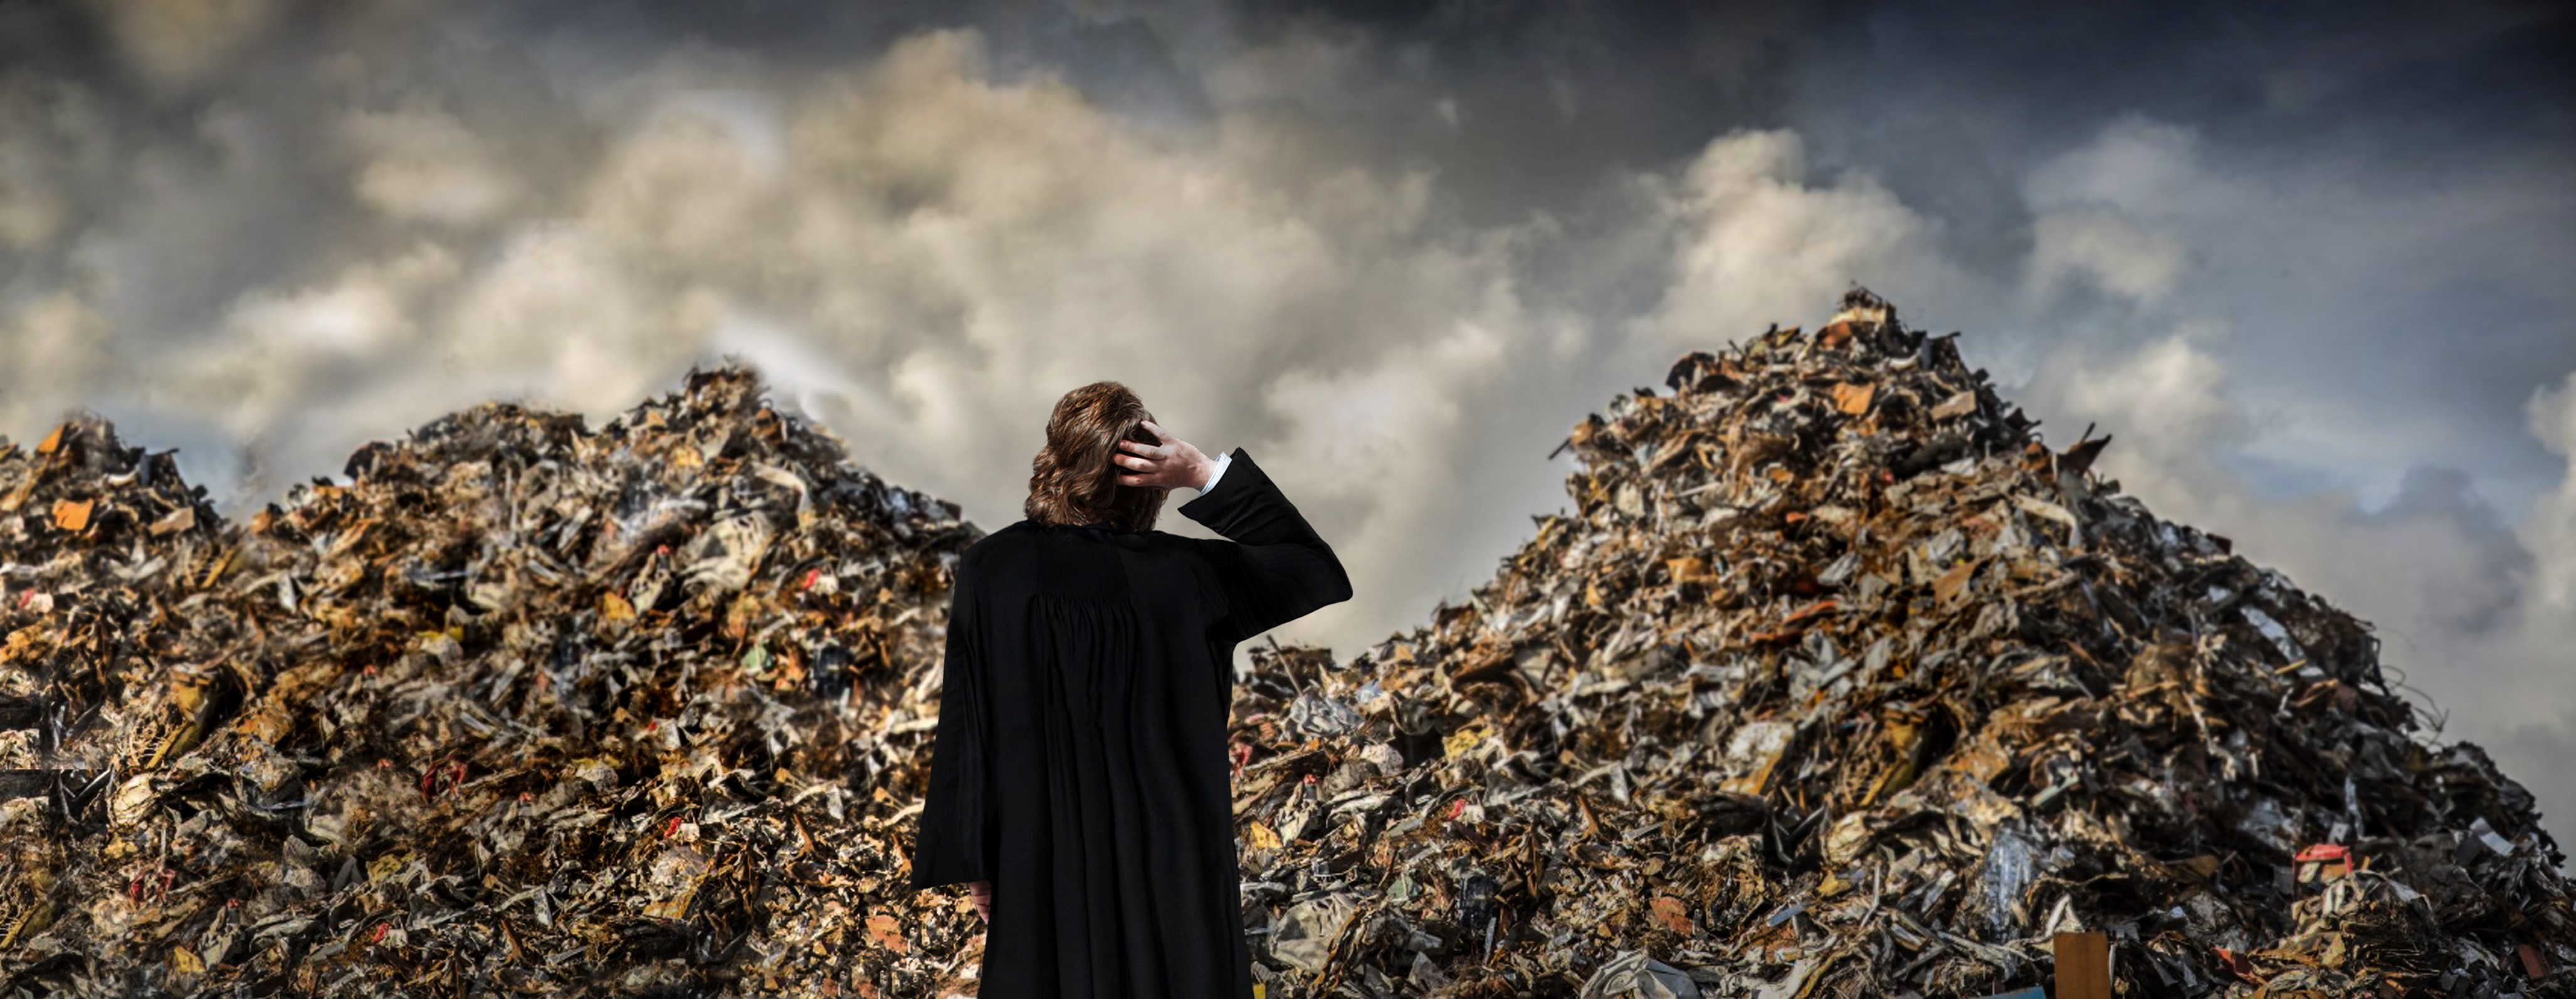 Themamiddag afvalstoffen